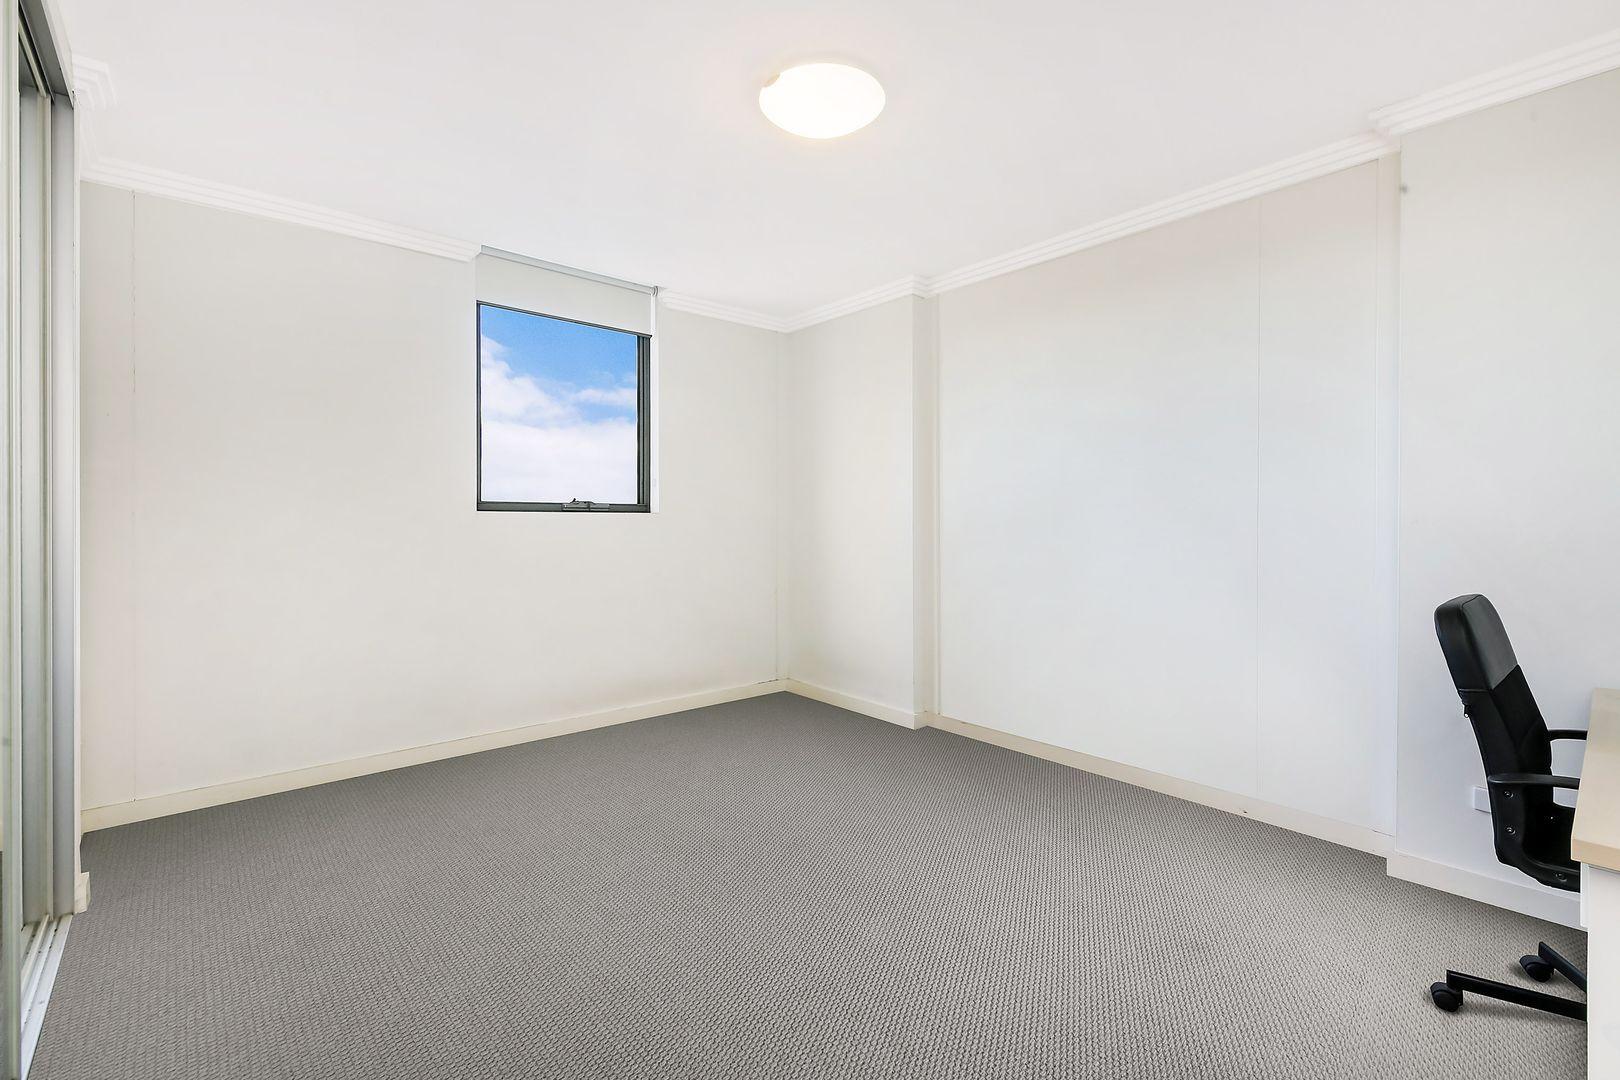 59/30-32 Woniora Road, Hurstville NSW 2220, Image 2